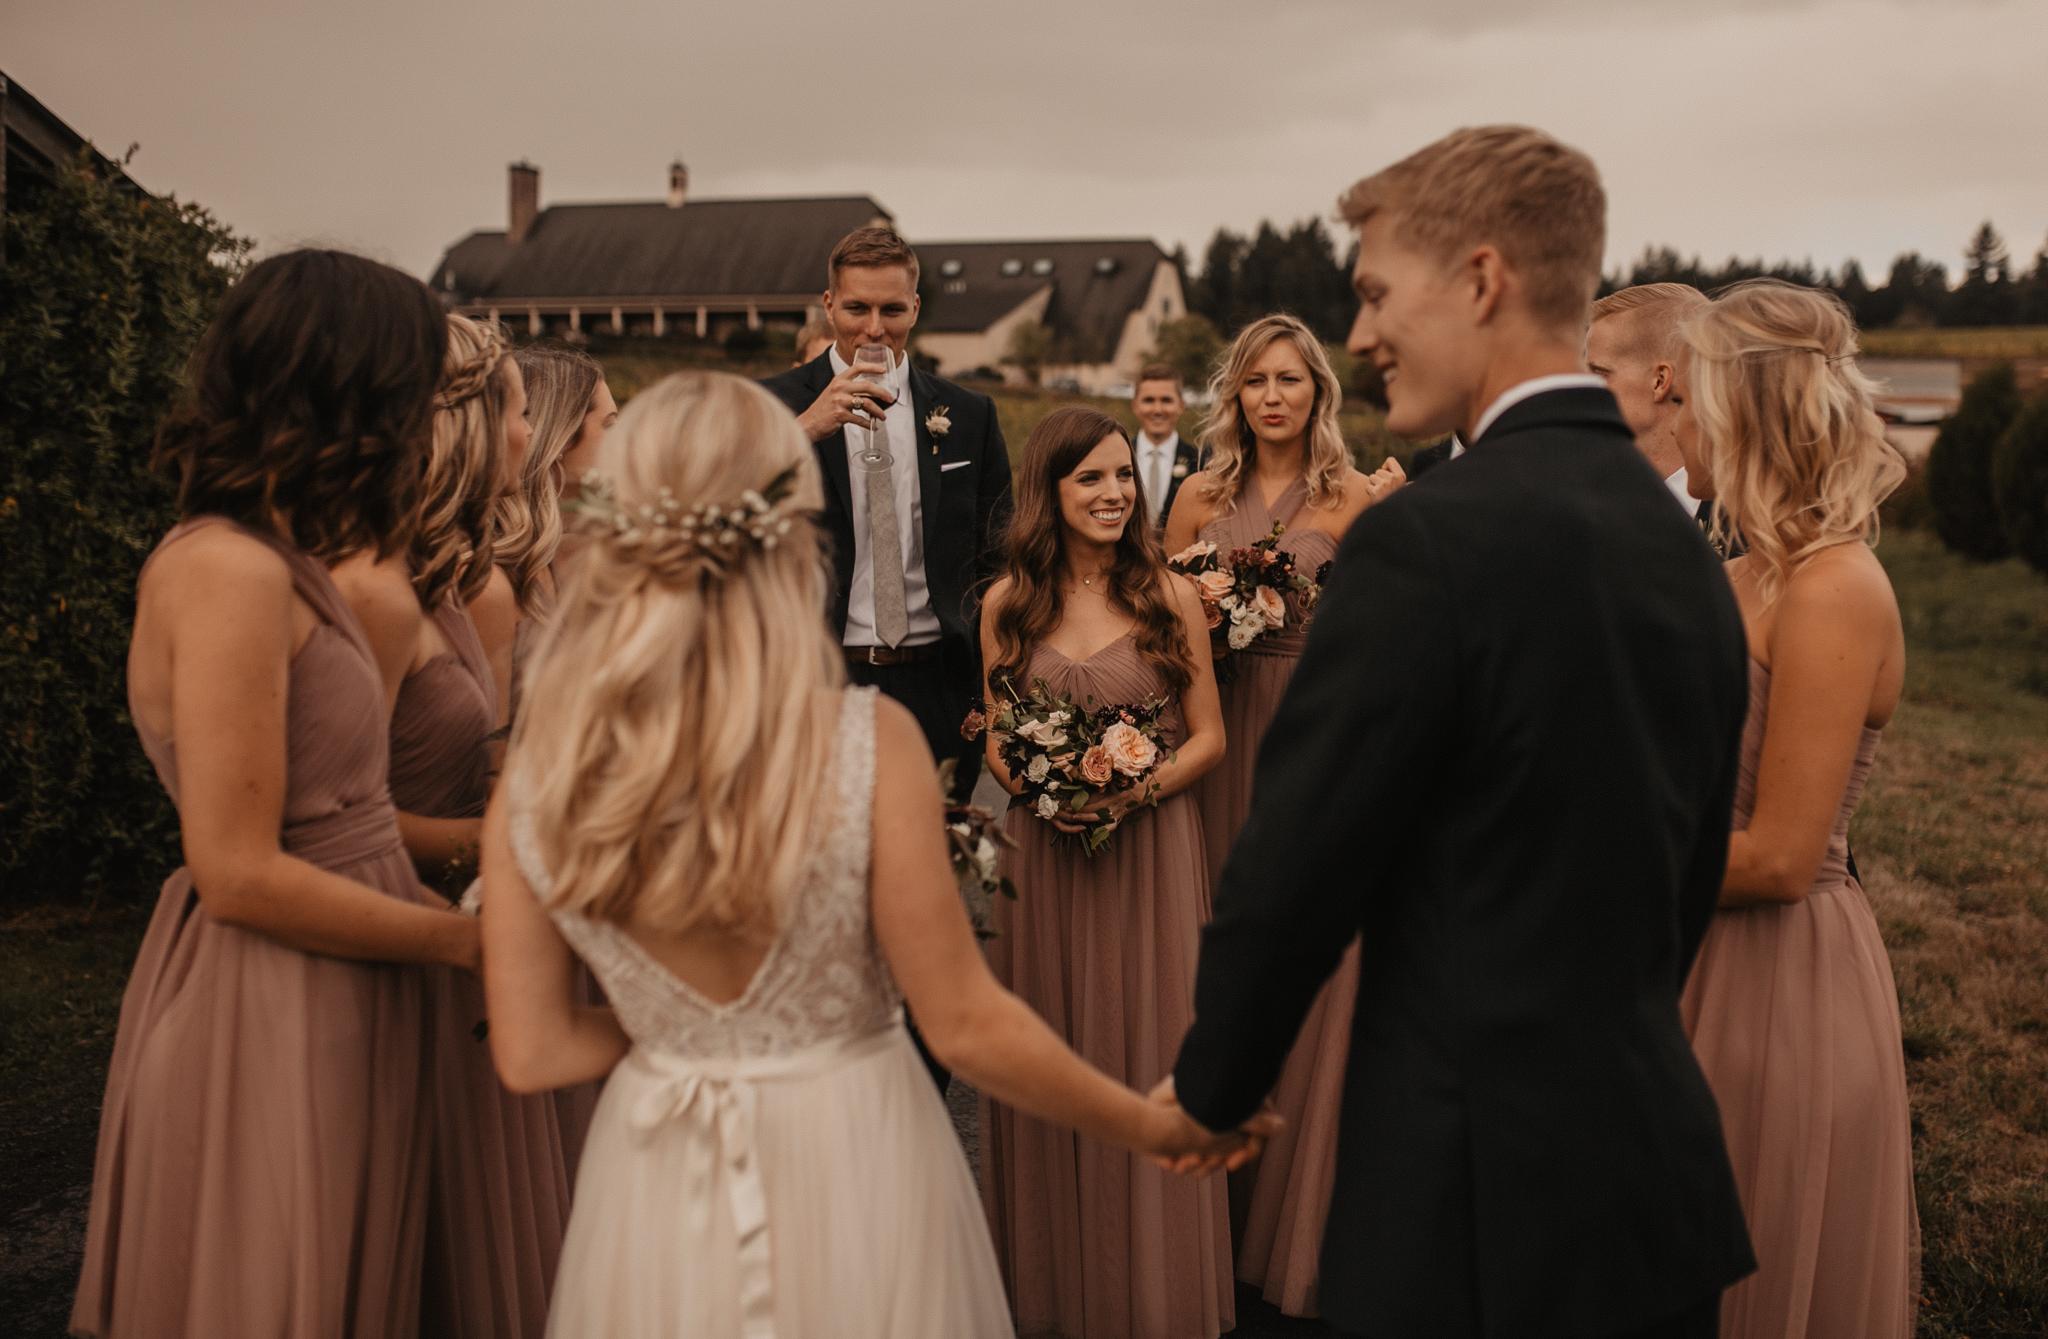 zenith-vineyard-oregon-summer-wedding-308.jpg